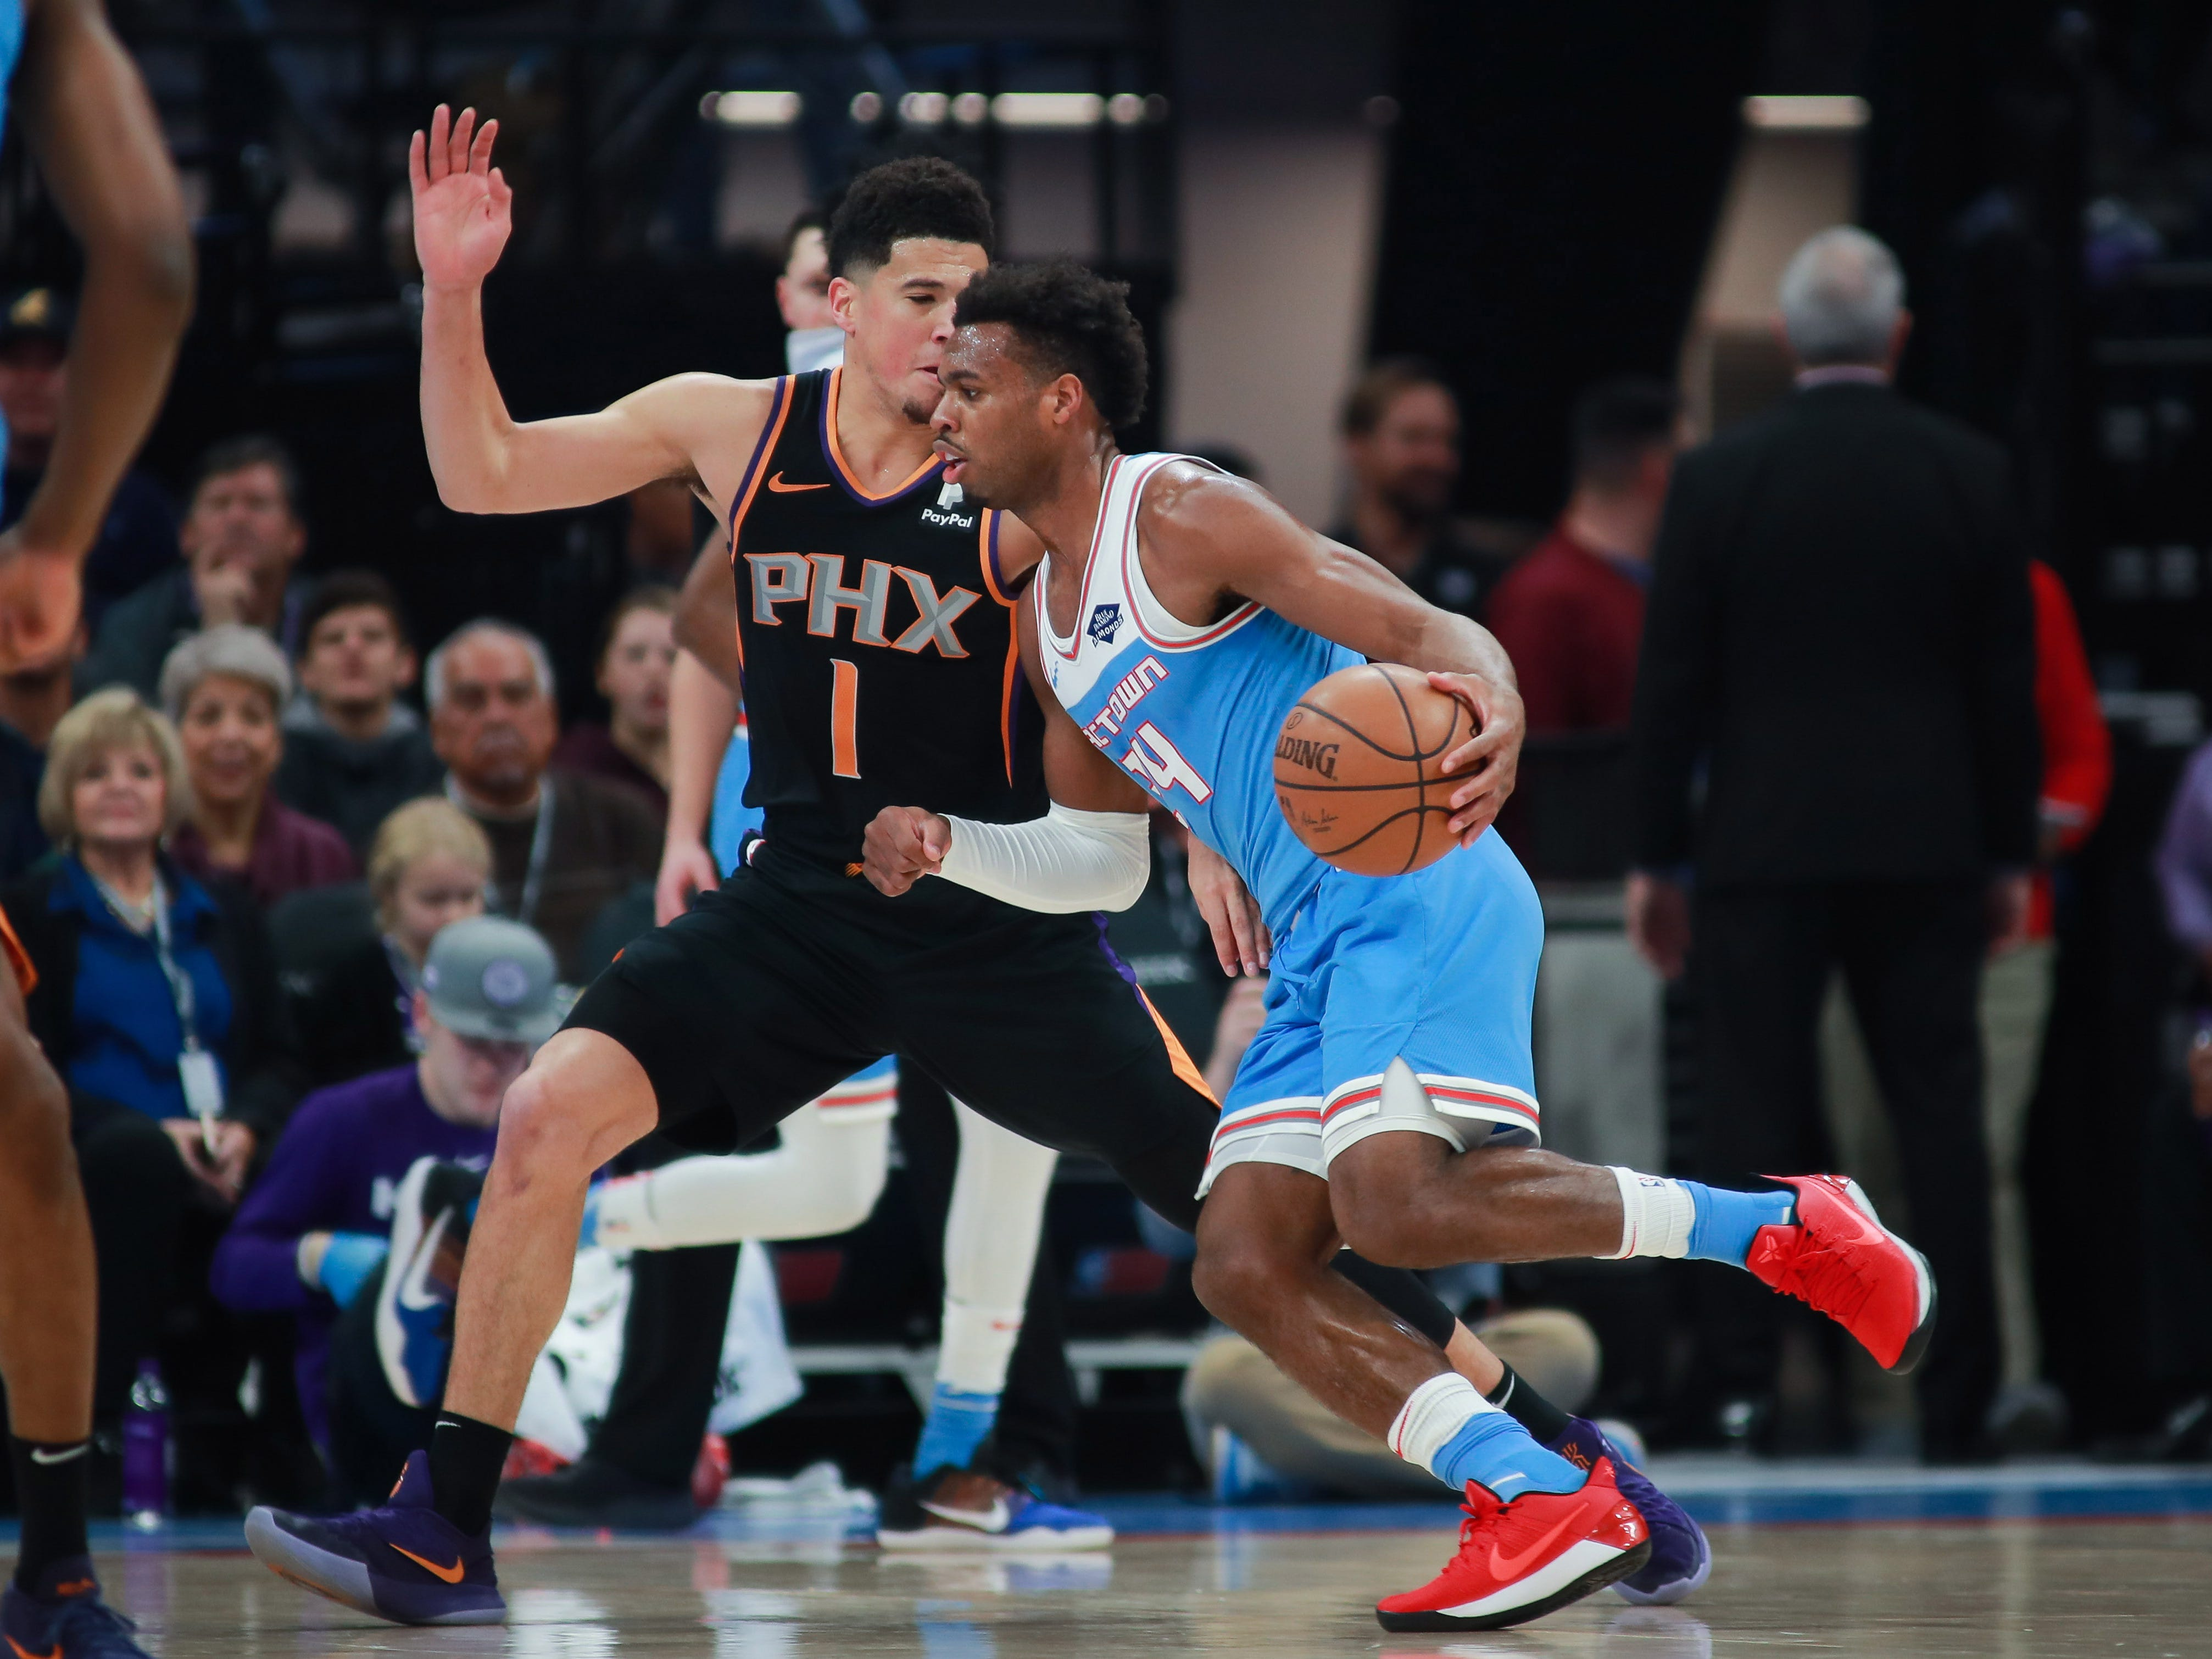 Feb 10, 2019; Sacramento, CA, USA; Sacramento Kings guard Buddy Hield (24) dribbles the ball around Phoenix Suns guard Devin Booker (1) during the first quarter at Golden 1 Center.